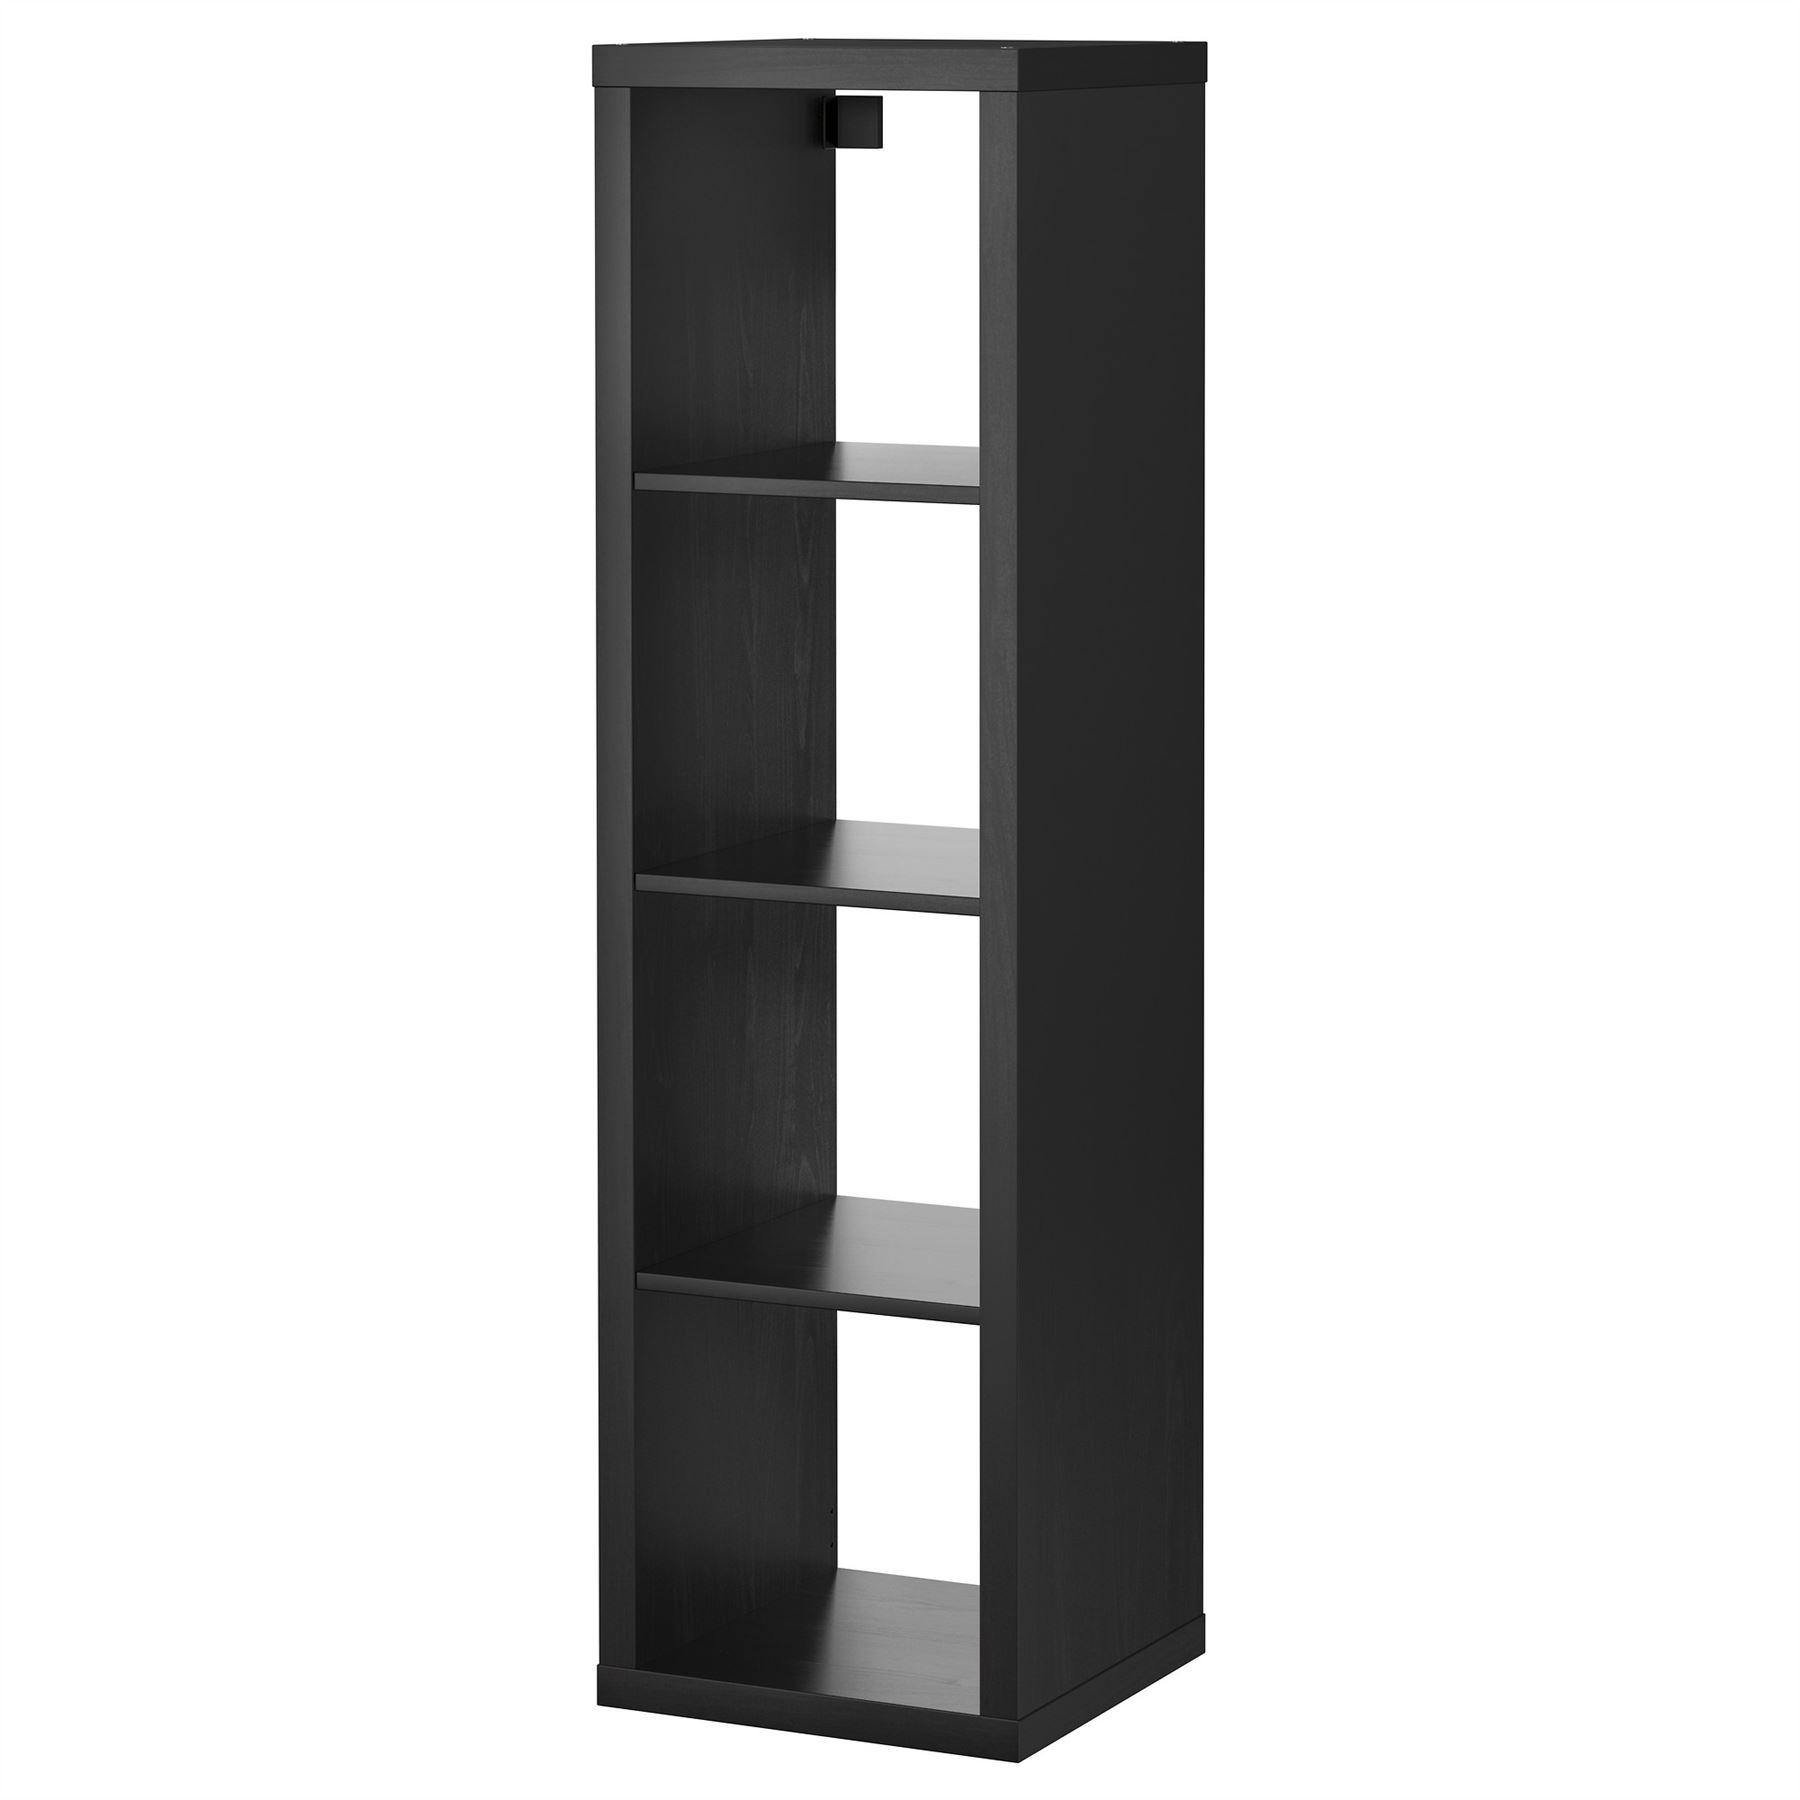 Ikea Kallax 4 Cube Storage Bookcase Rectangle Shelving Unit Various